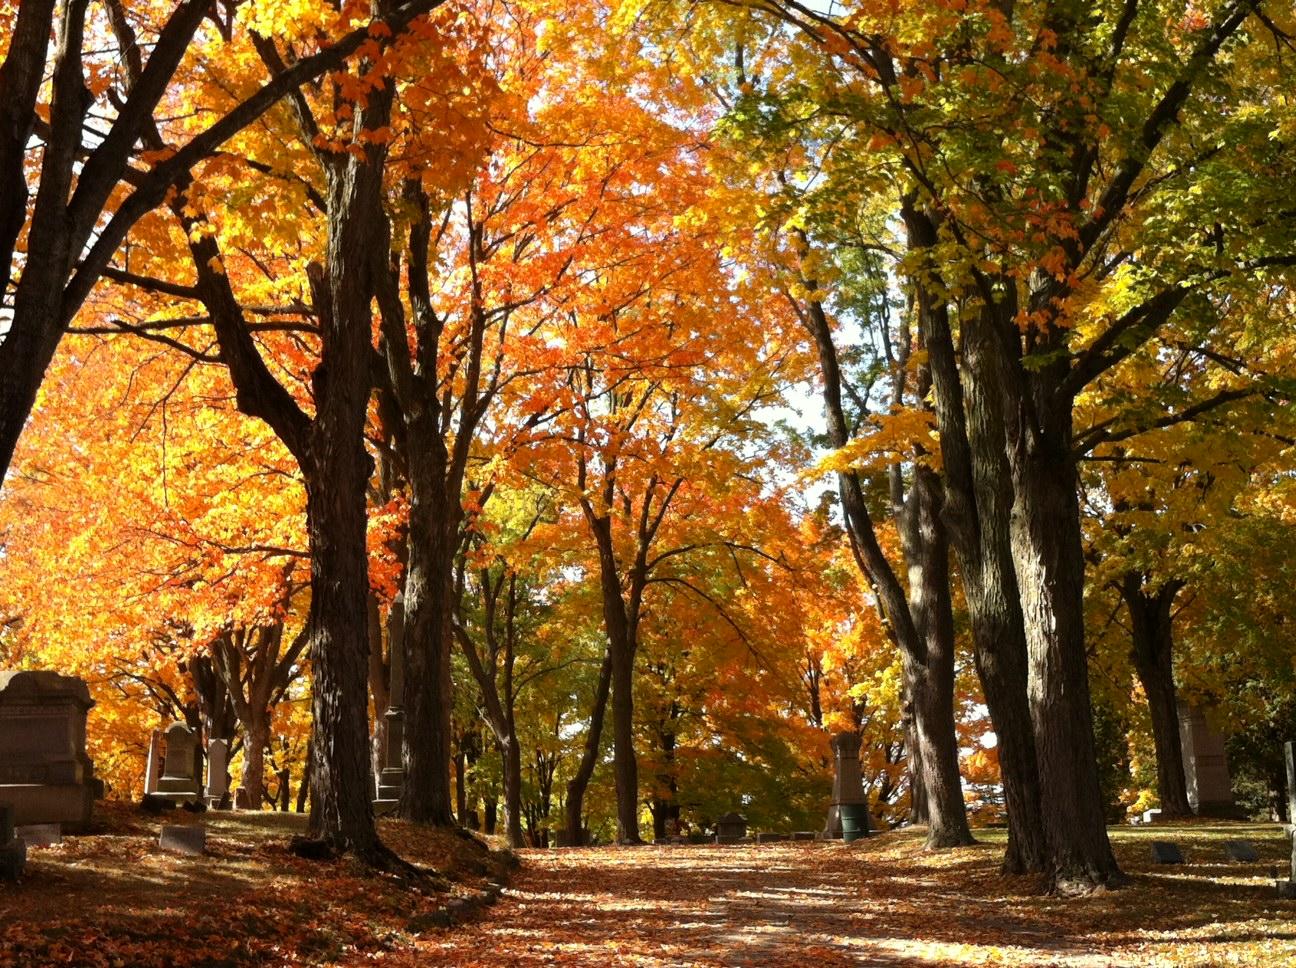 Fall+13+bigger+picture.jpg